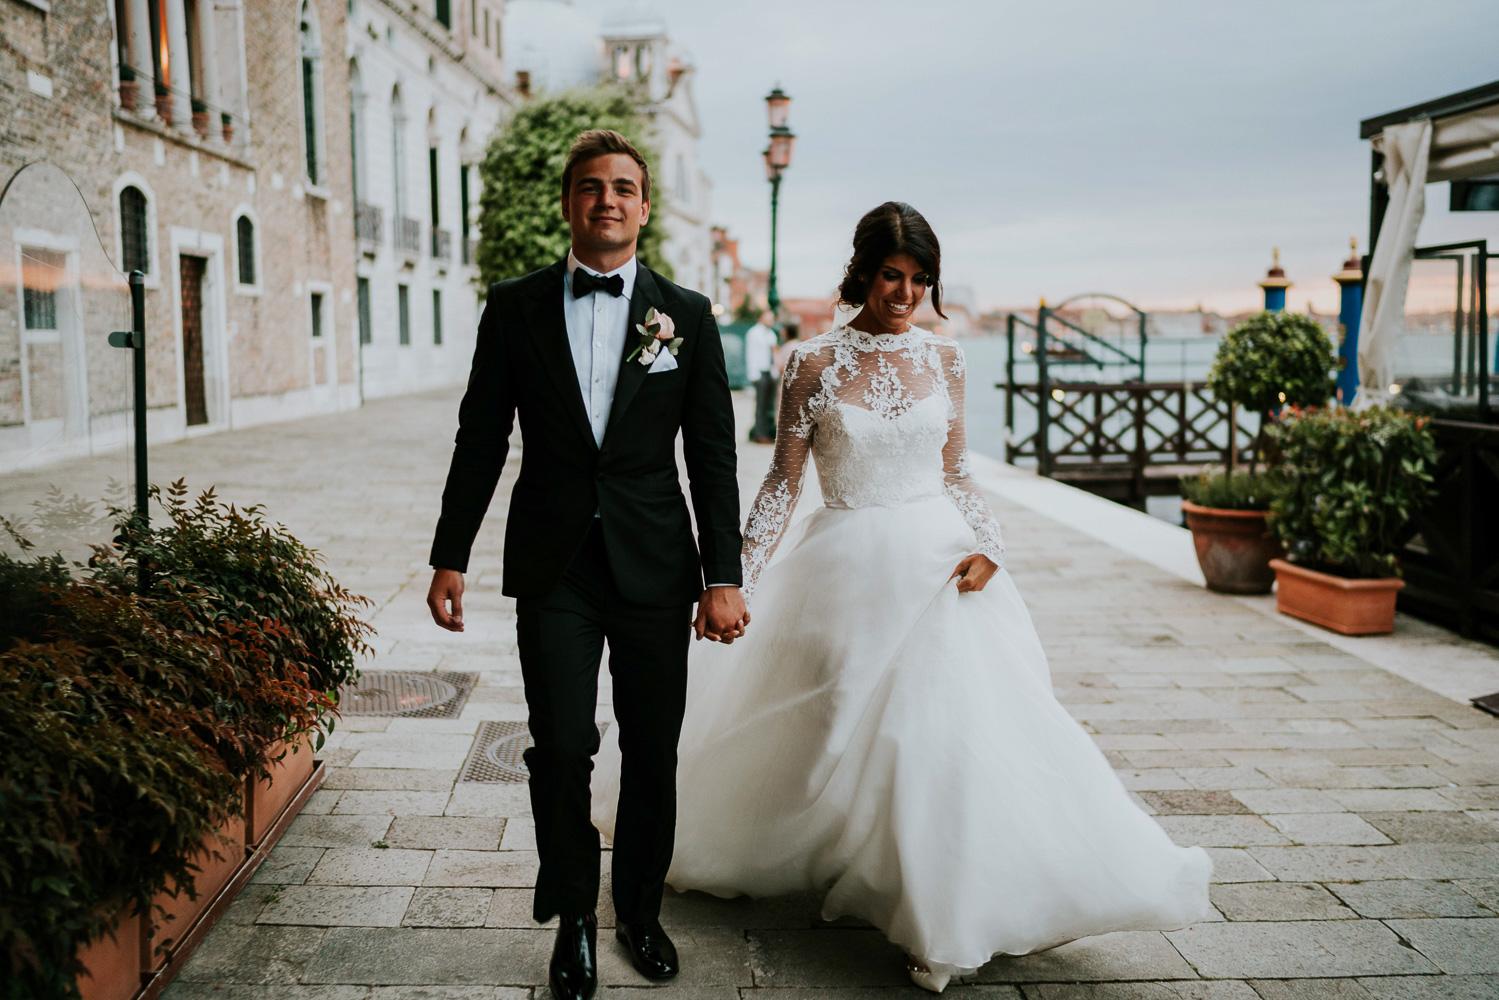 Bride In Romona Keveza Gown Groom Black Tuxedo Super Luxe Greek Wedding At: Black Suit Pink Wedding Dress At Reisefeber.org